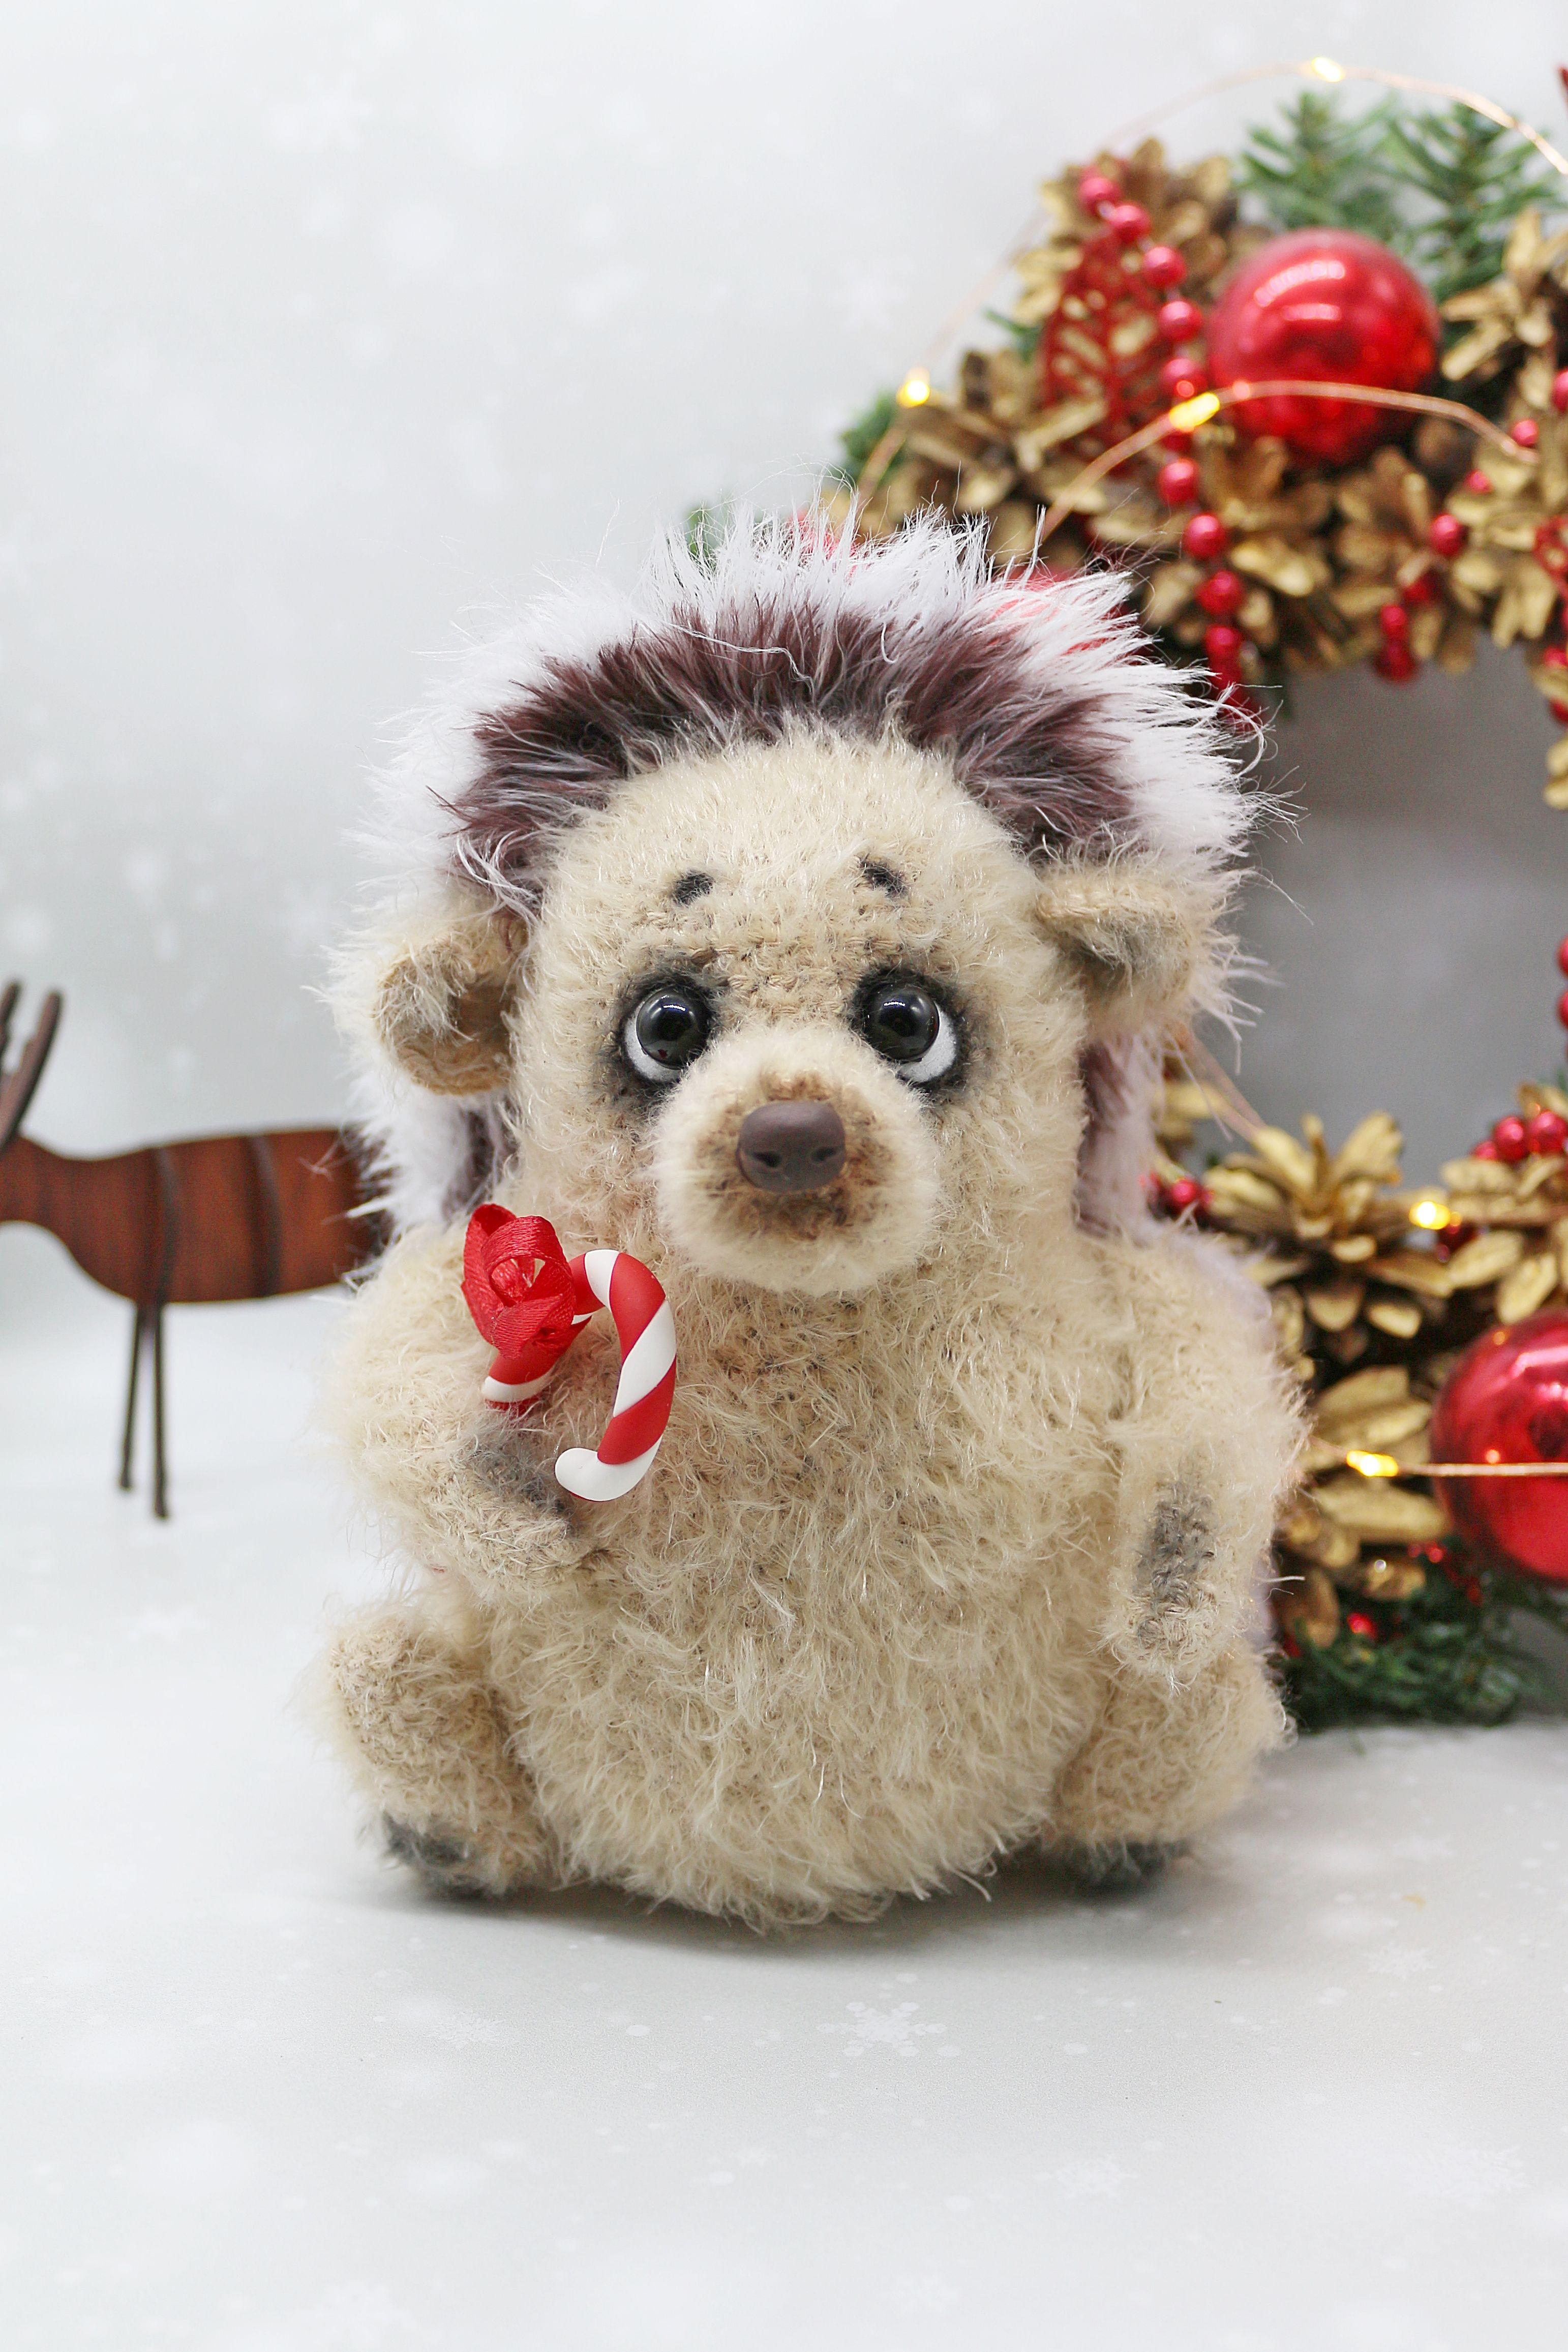 Cute Beige Hedgehog Crochet Amigurumi Animal Interior Toy 5 Etsy Toys Pet Toys Baby Hedgehog [ 4626 x 3084 Pixel ]